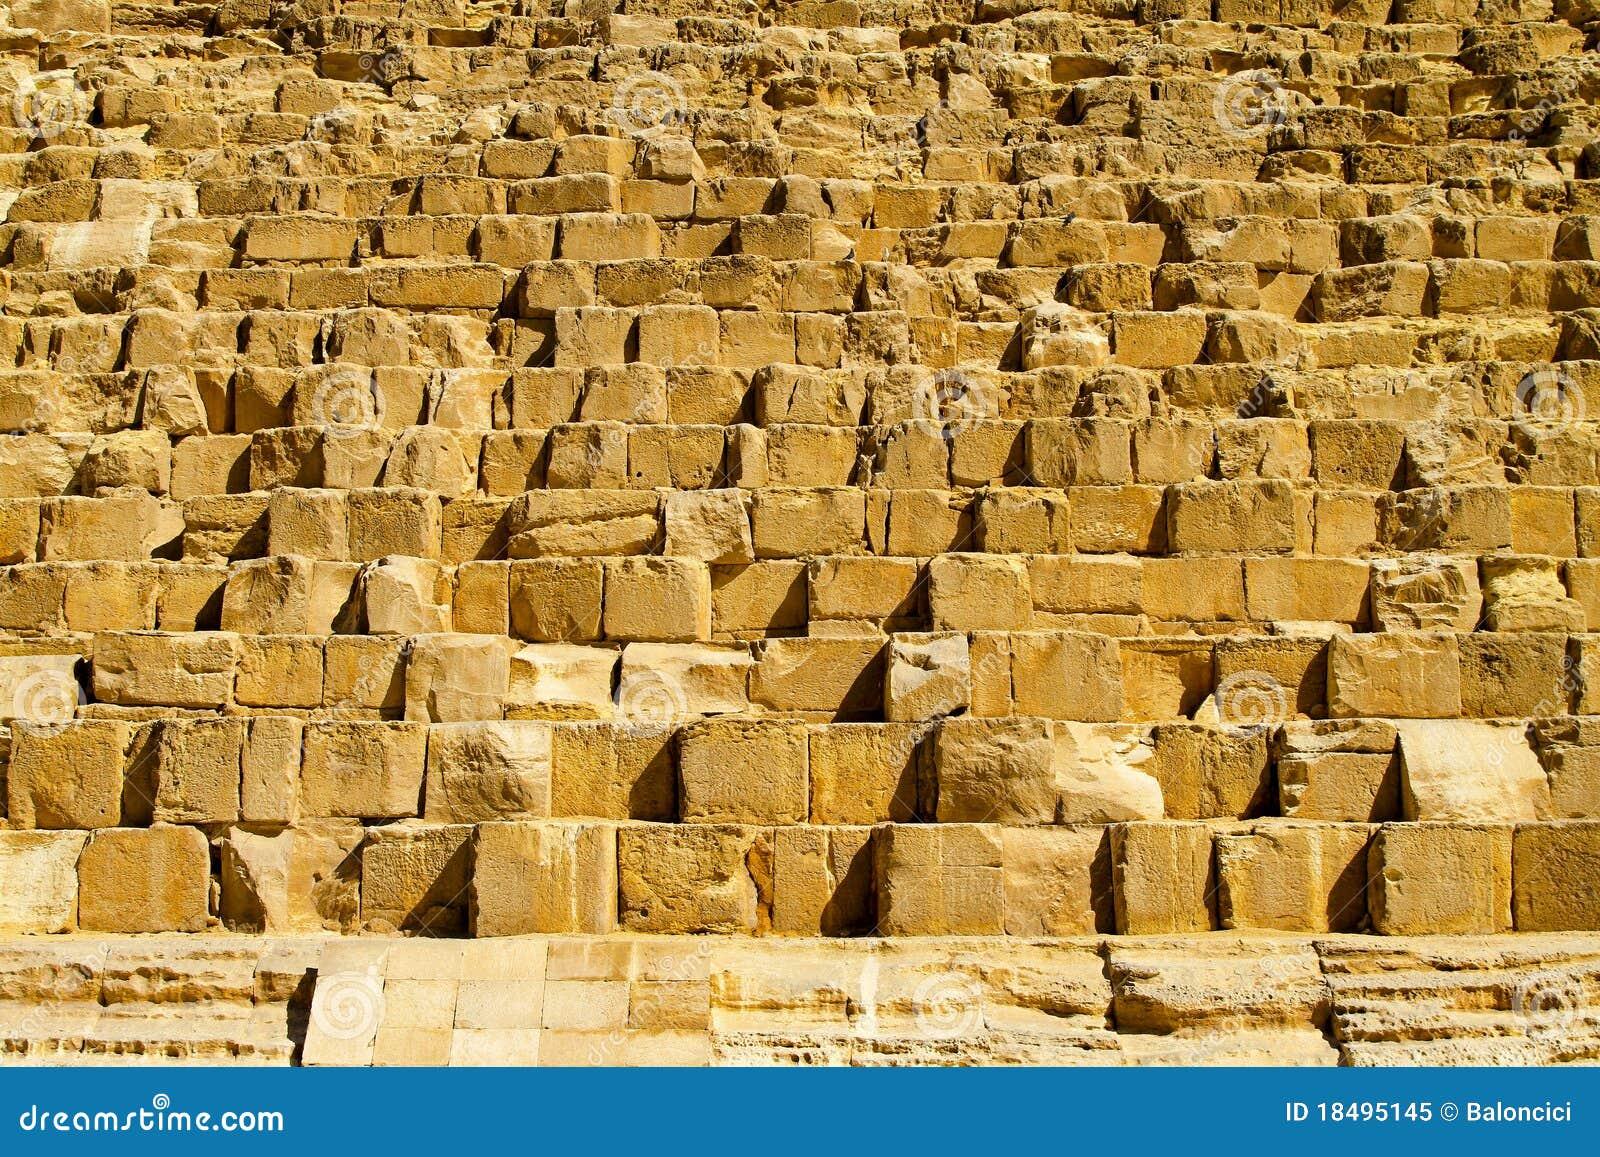 blocs de pierre de pyramide photo libre de droits image 18495145. Black Bedroom Furniture Sets. Home Design Ideas